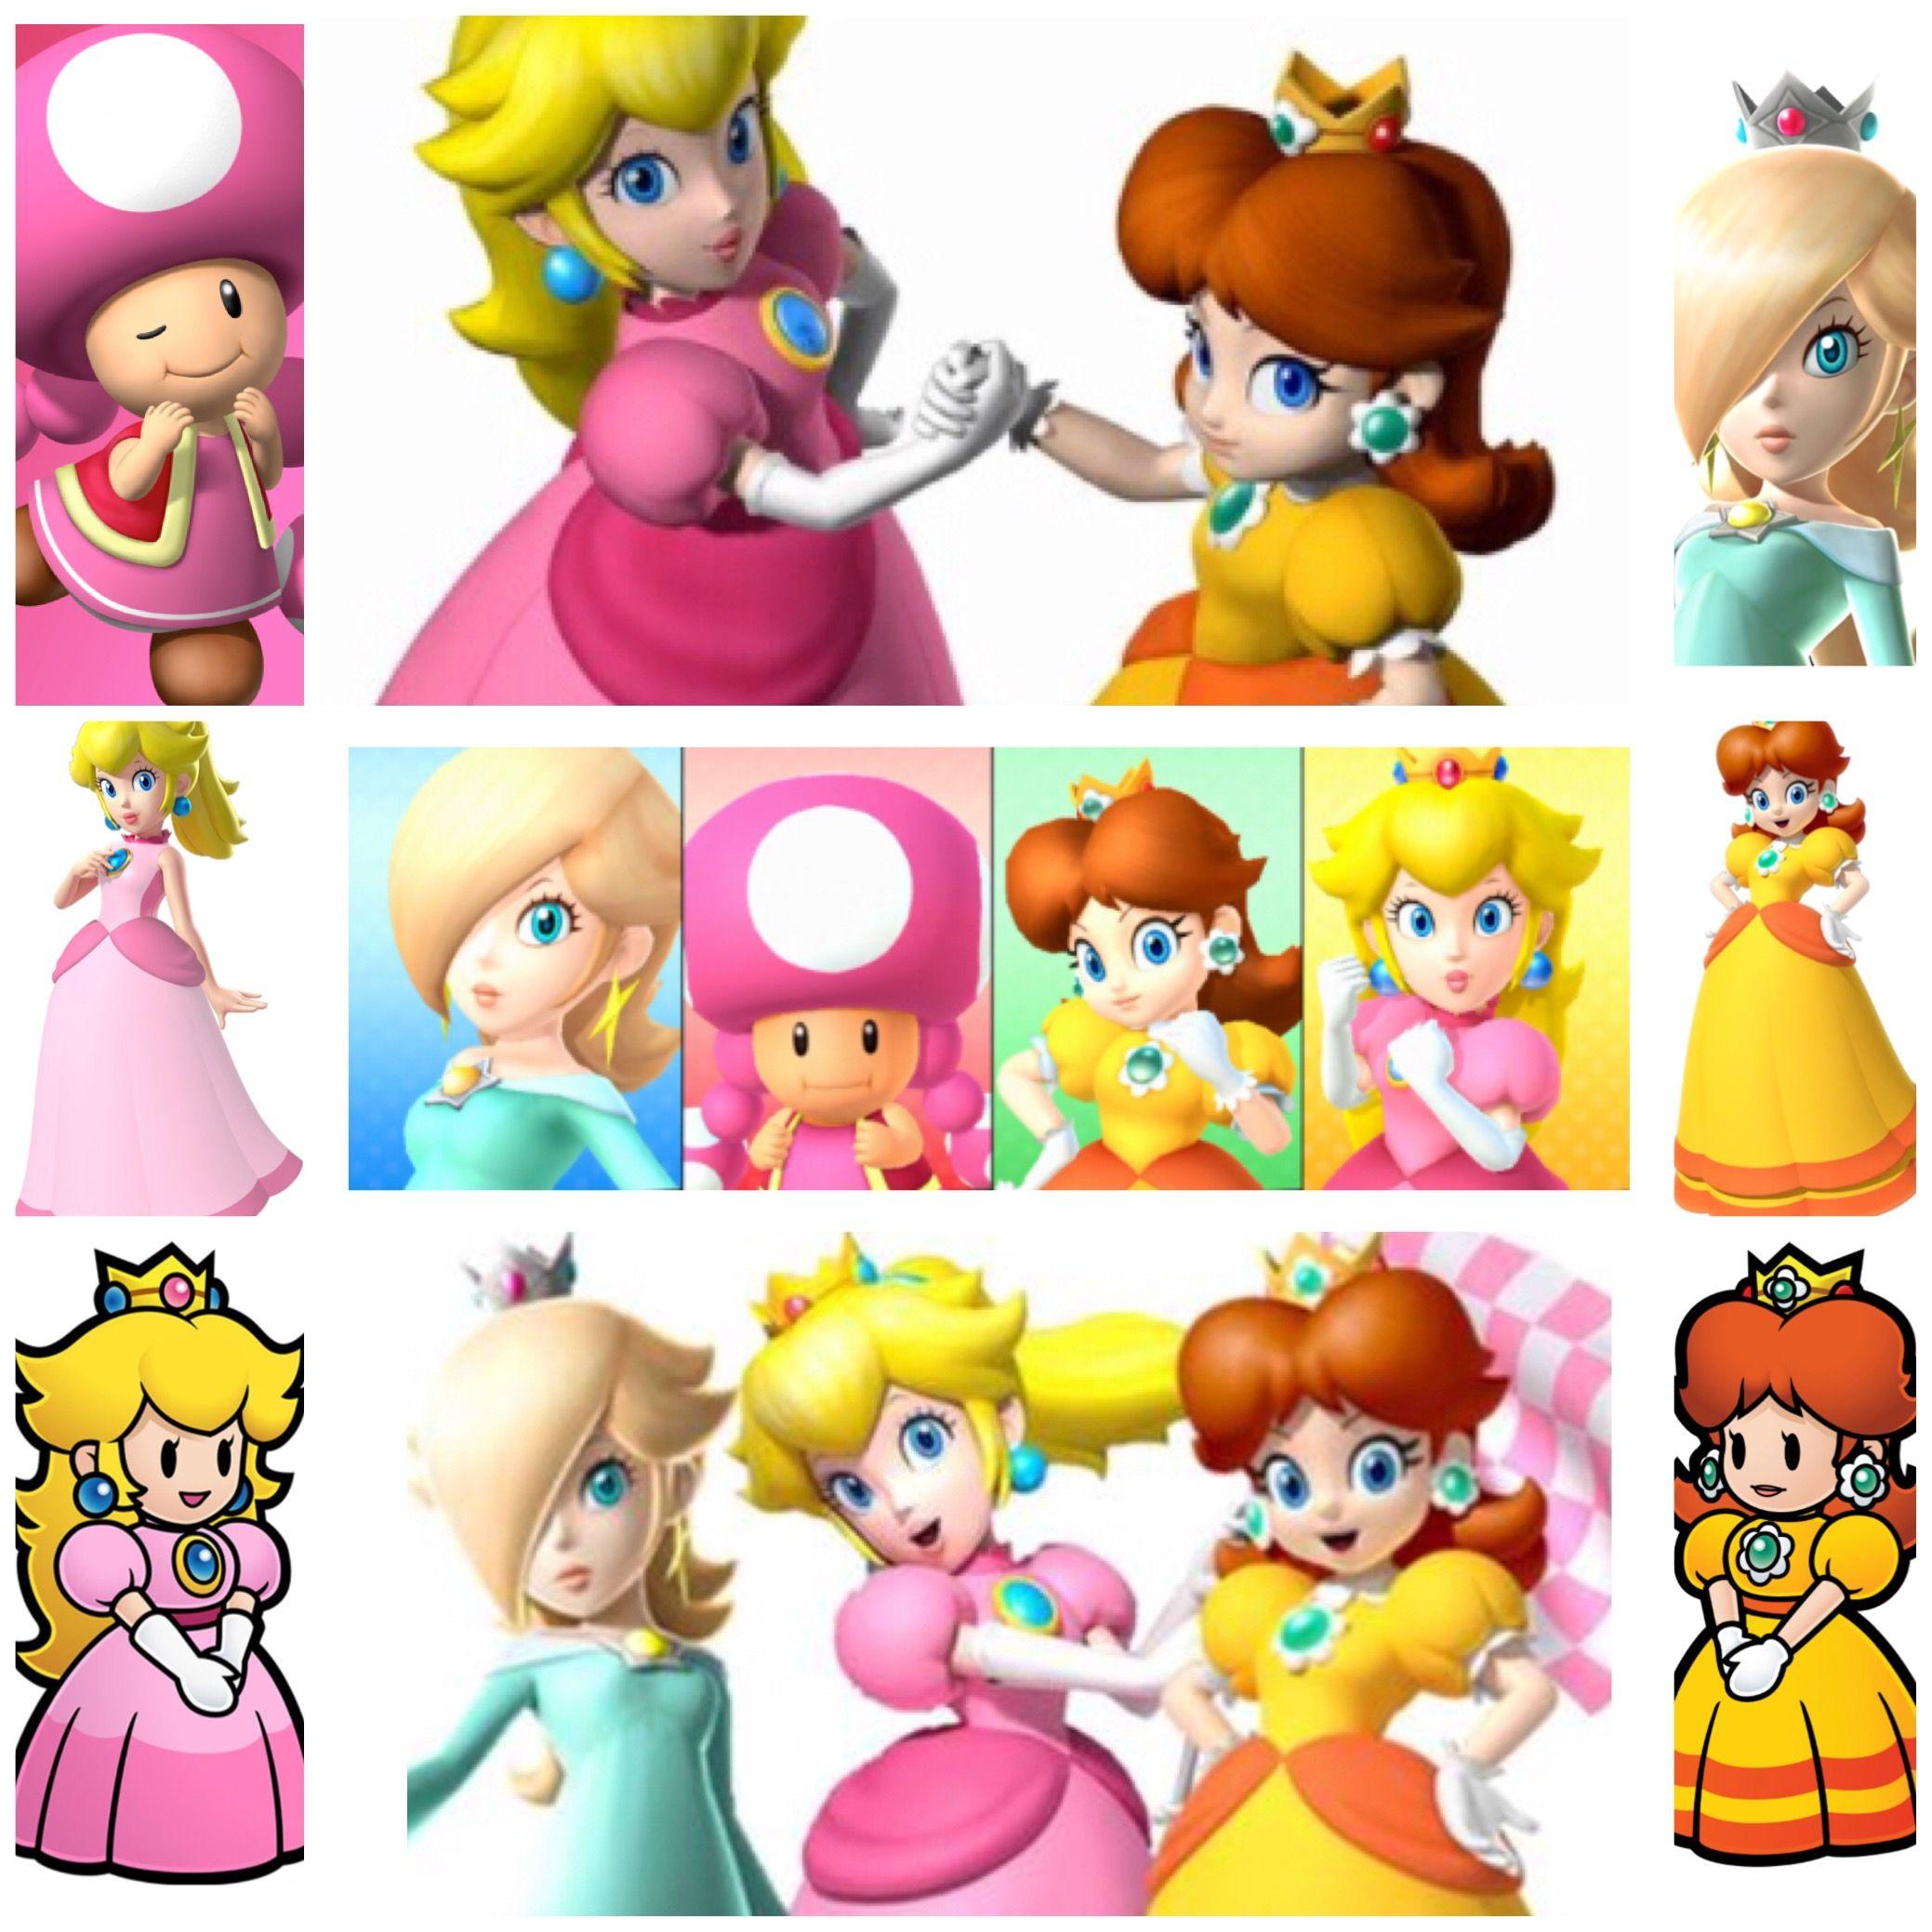 Princess Peach Daisy Rosalina And Toadette Peach Princess Peach Daisy